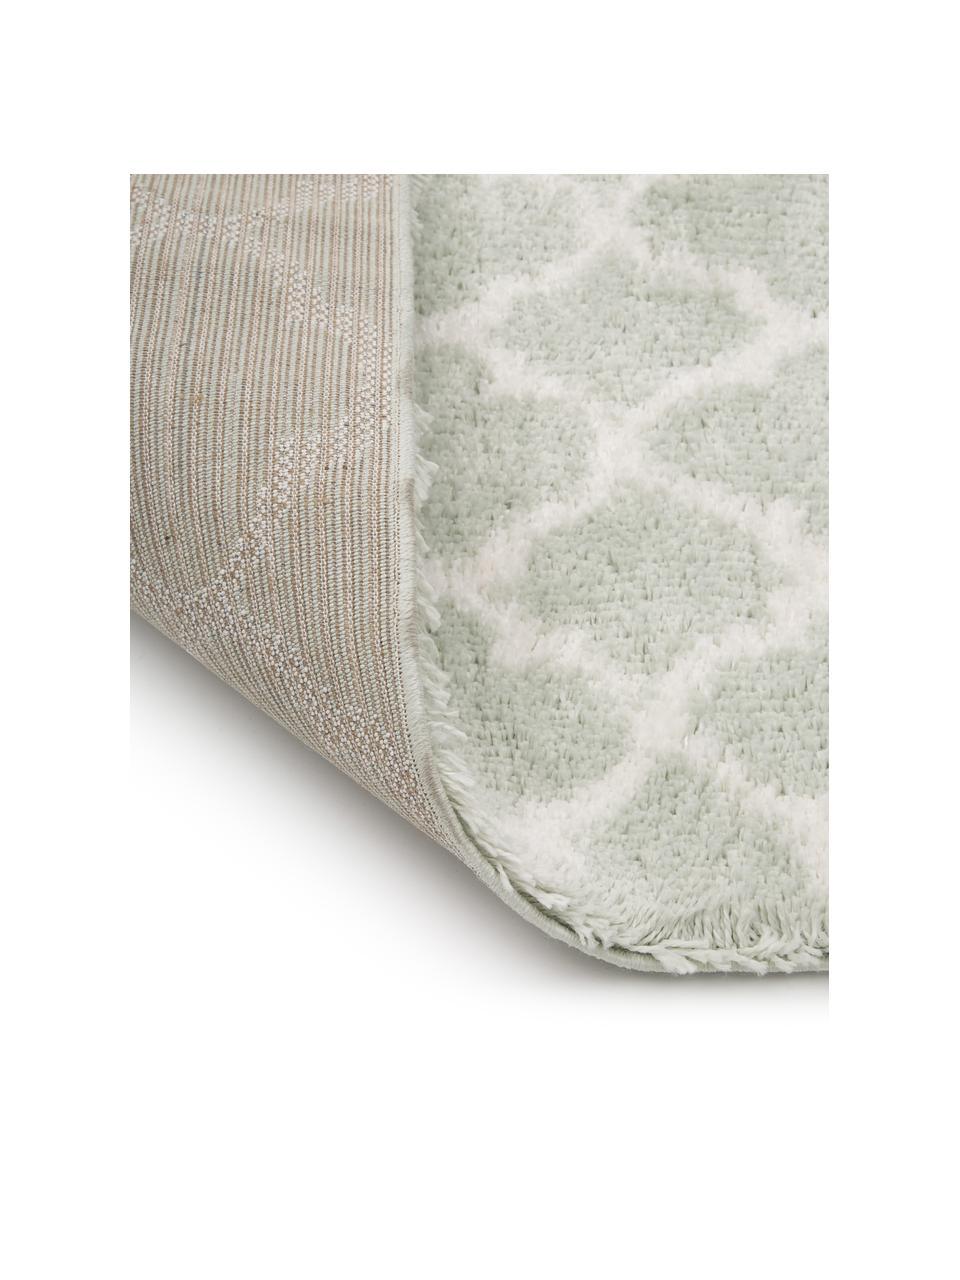 Passatoia a pelo lungo verde menta/crema Mona, Retro: 78% juta, 14% cotone, 8% , Verde menta, bianco crema, Larg. 80 x Lung. 250 cm